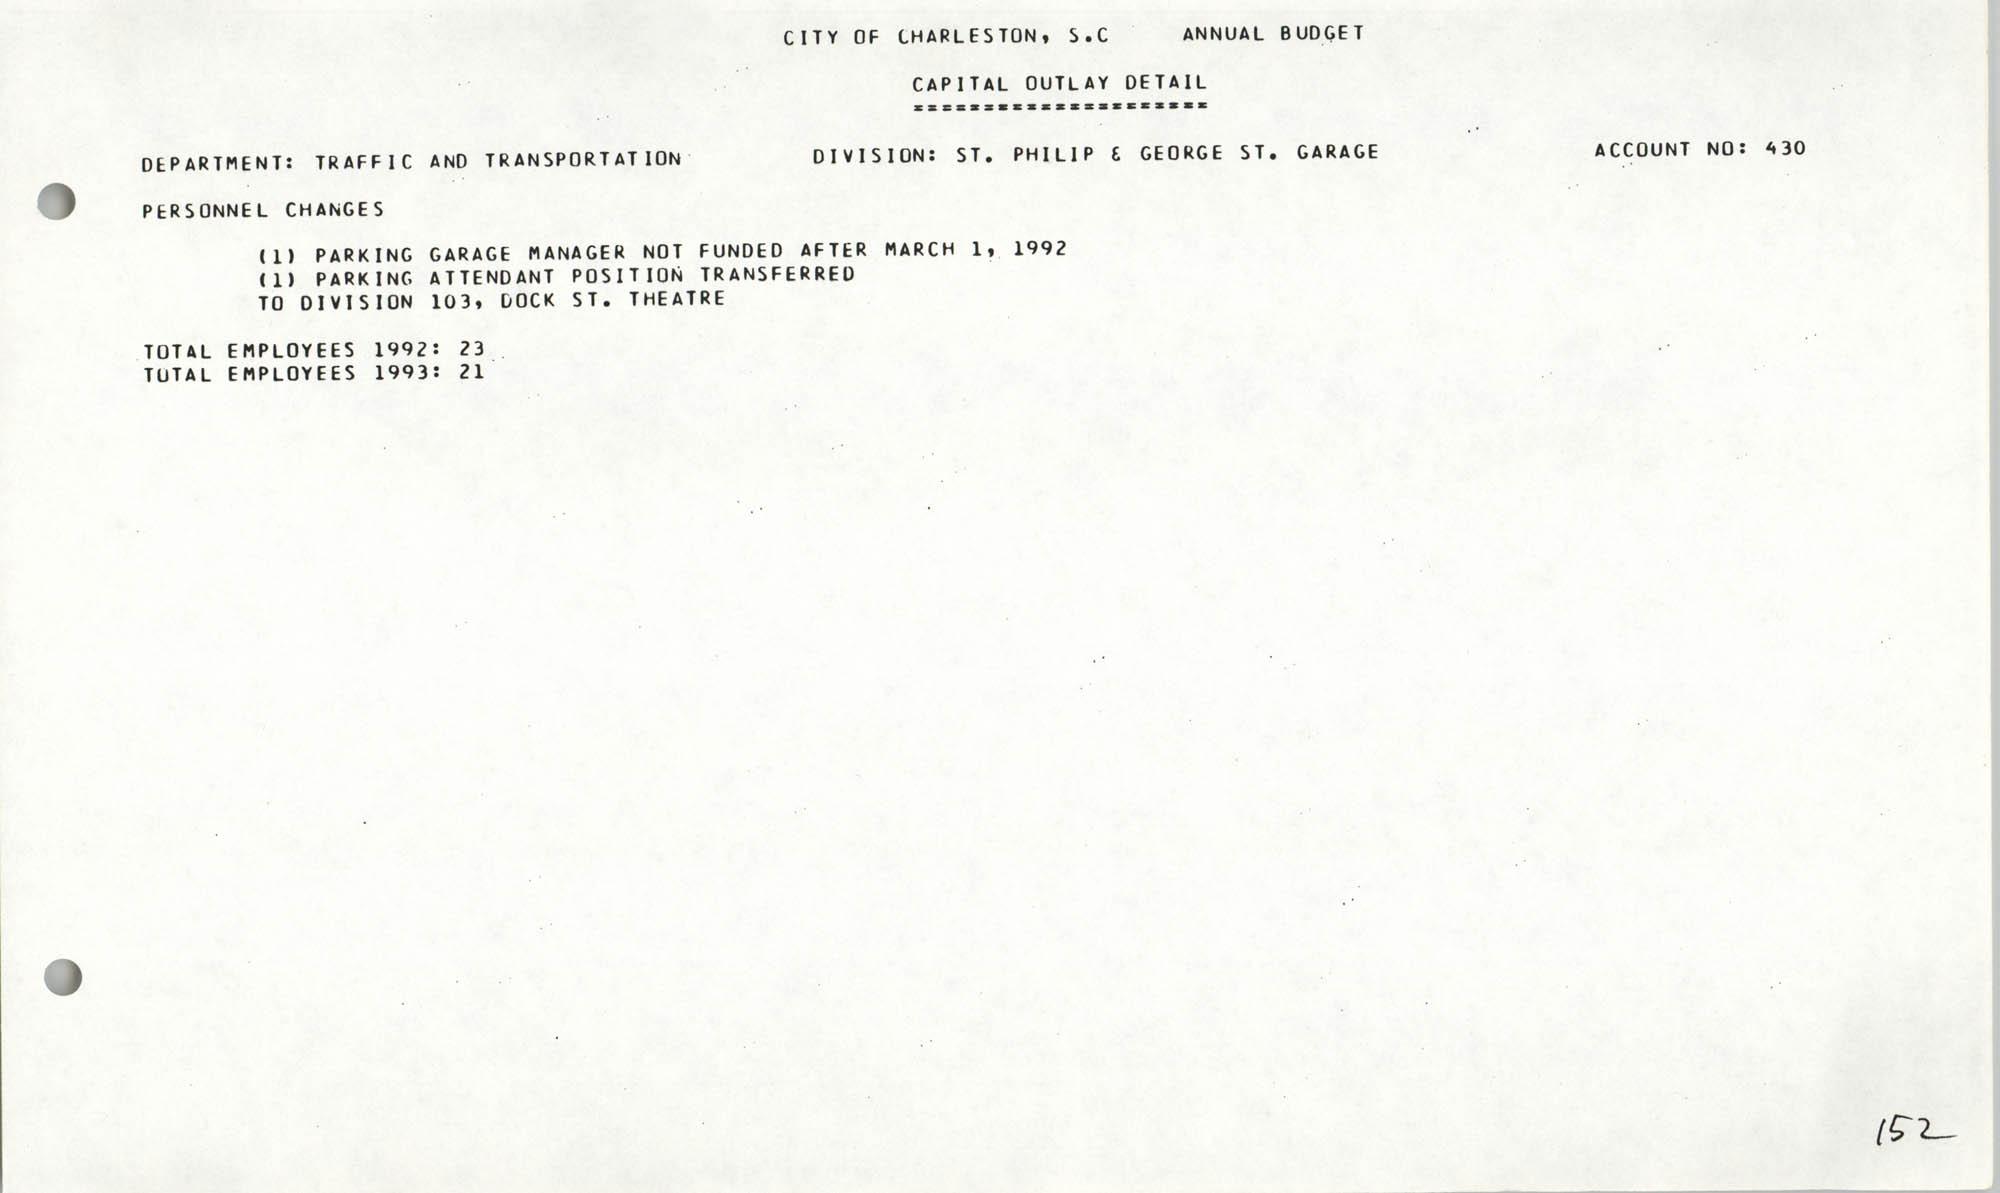 The City Council of Charleston, South Carolina, 1993 Budget, Page 152